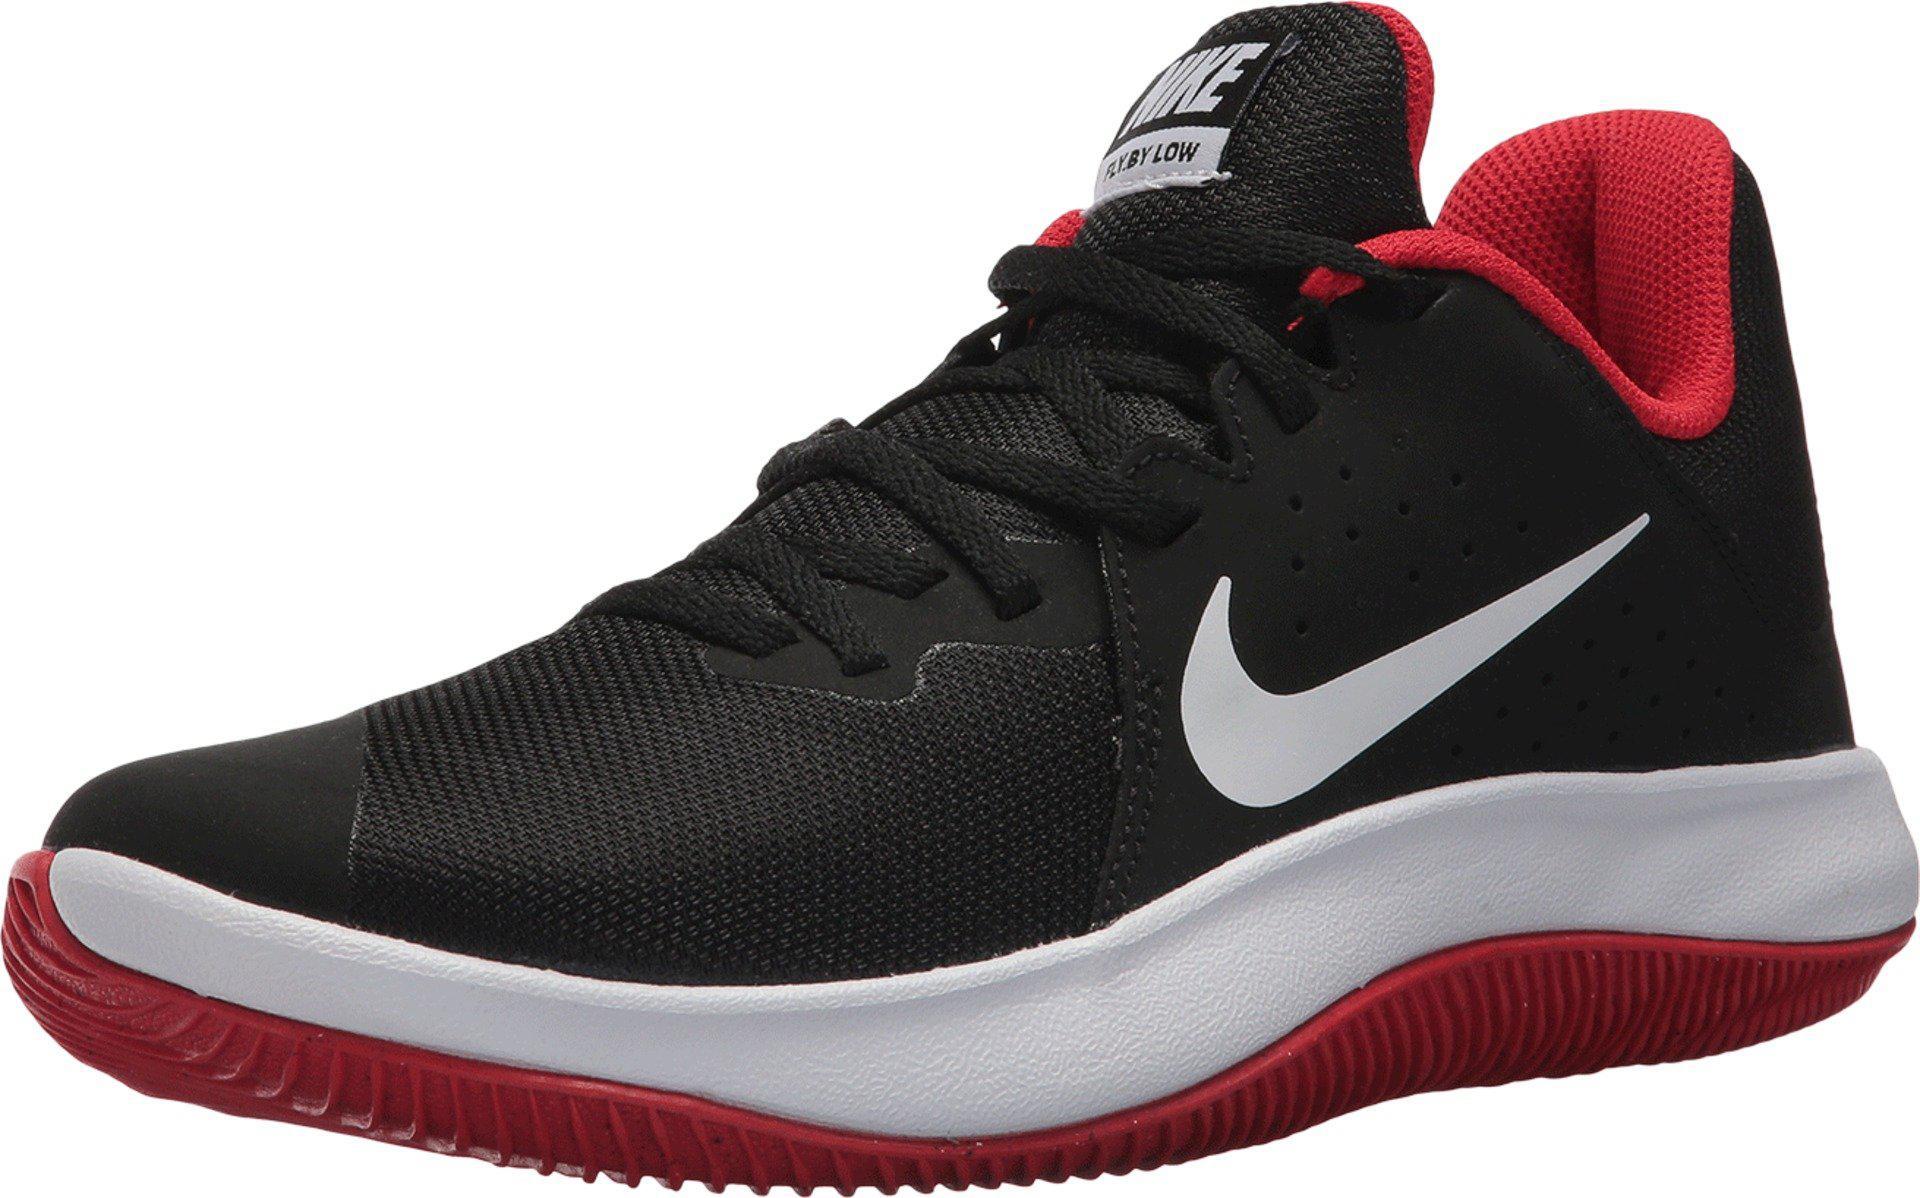 832c137ea6d6 Lyst - Nike Fly.by Low in Black for Men